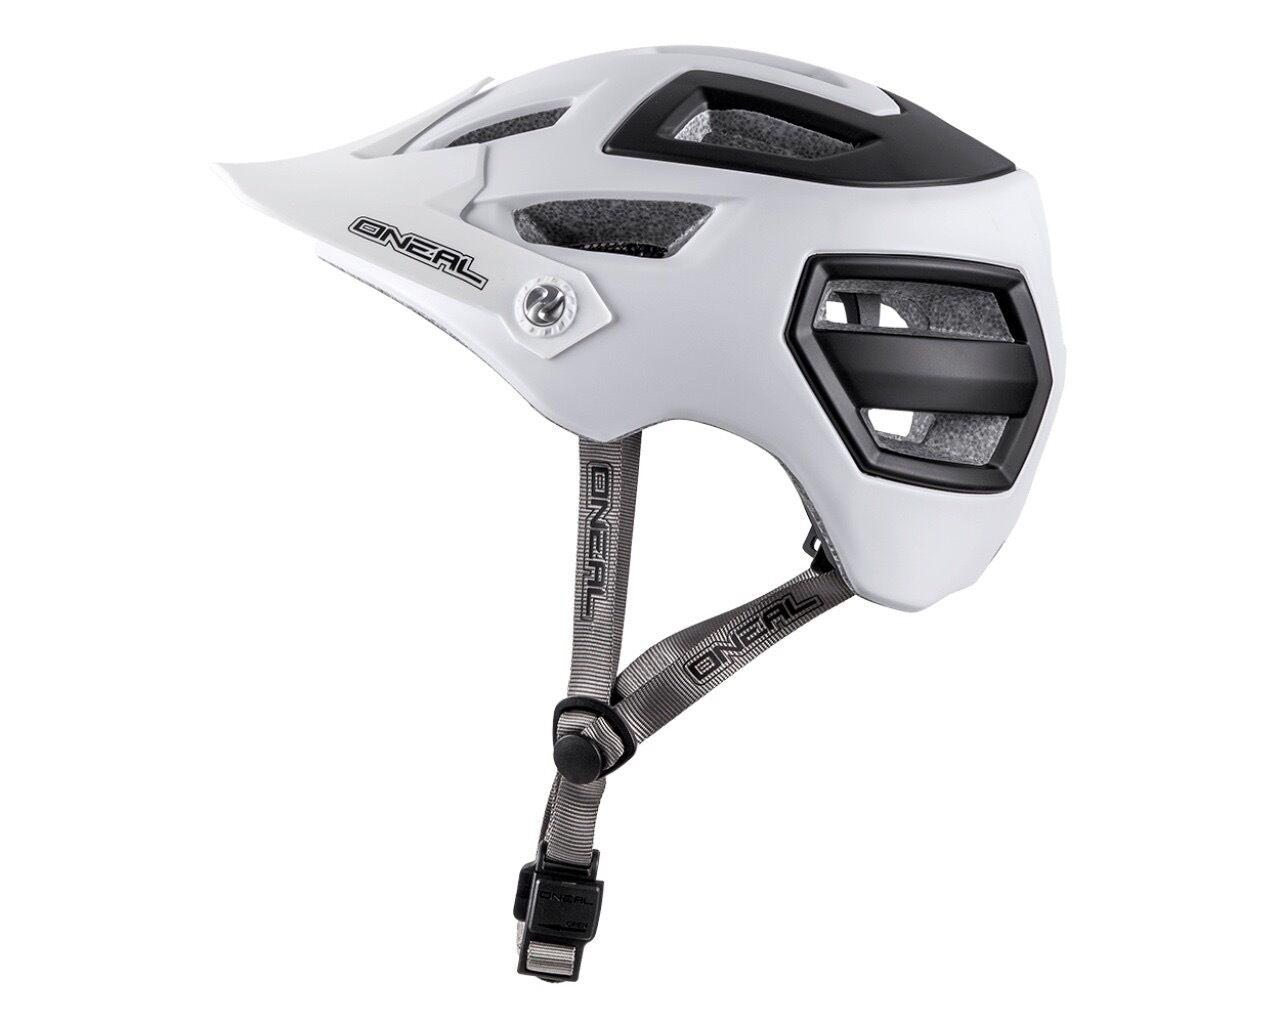 Helm ONEAL Hecht HELMET Farbe Schwarz-Weiss Schwarz-Weiss Schwarz-Weiss Größe 58-61cm 8780a5